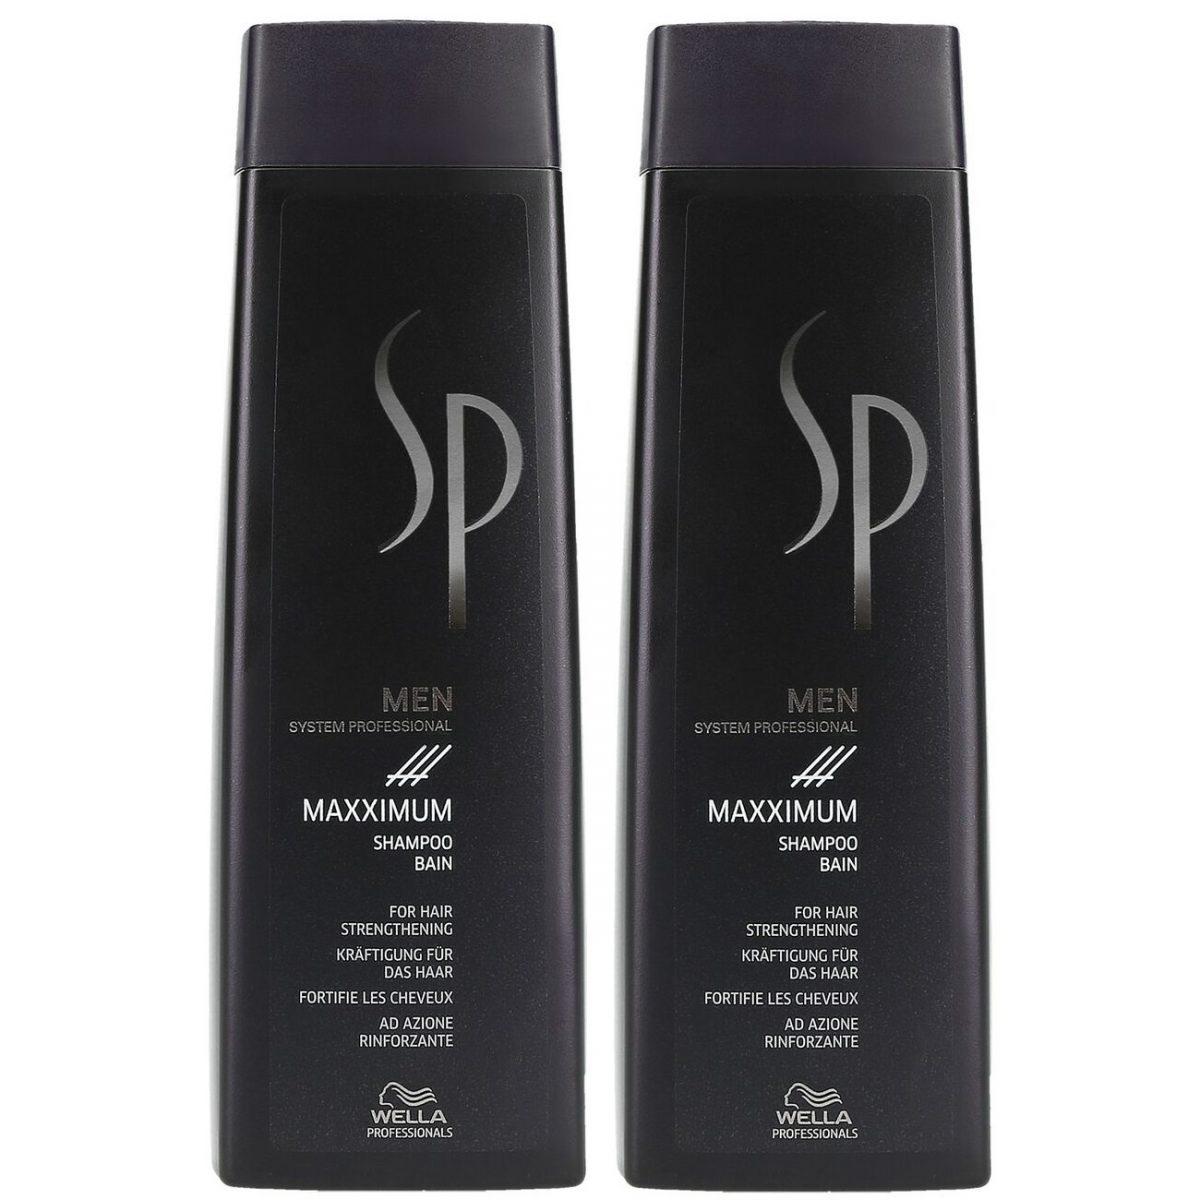 12_Emphase_Wella_SP_Maxximum_Duo_Shampoo_250ml